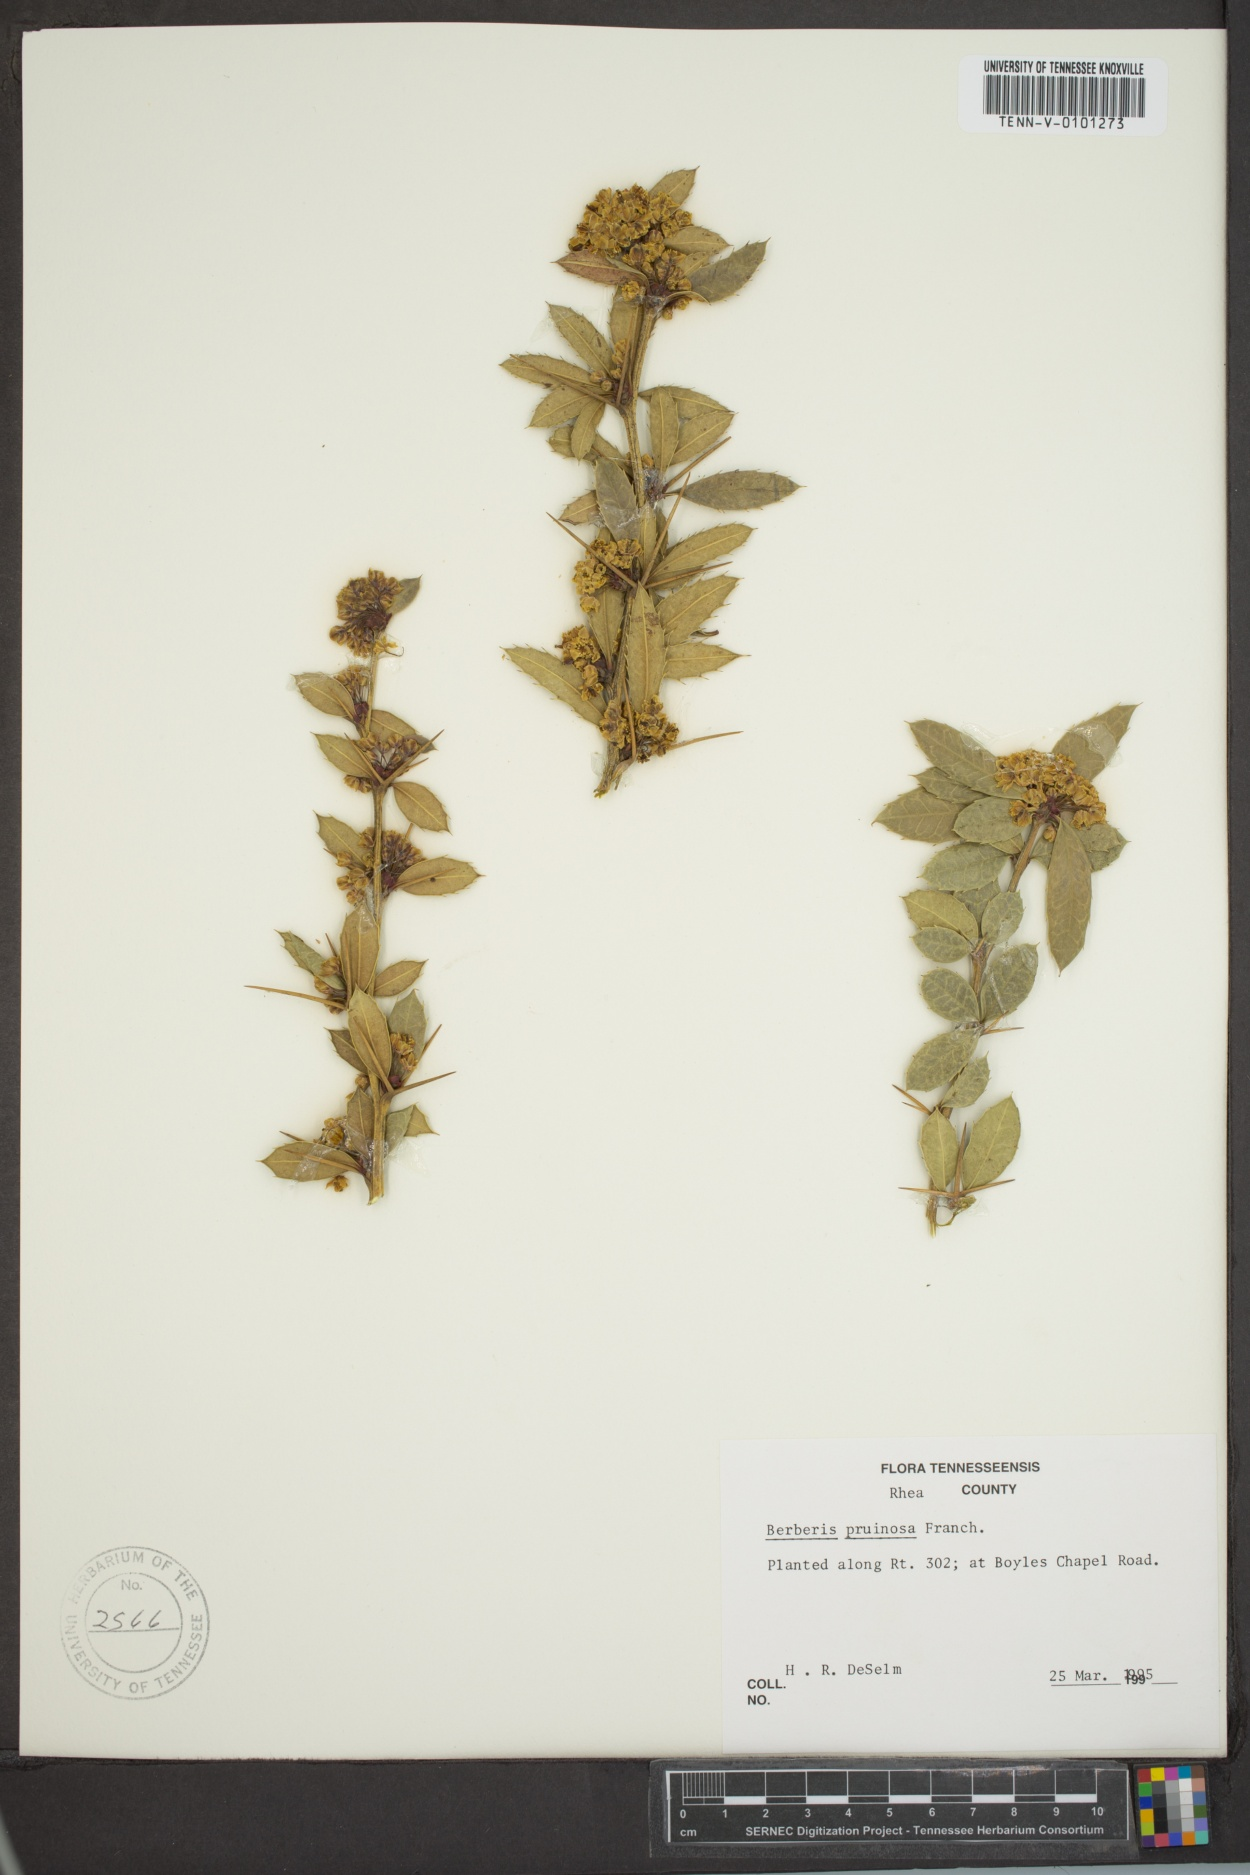 Berberis pruinosa image